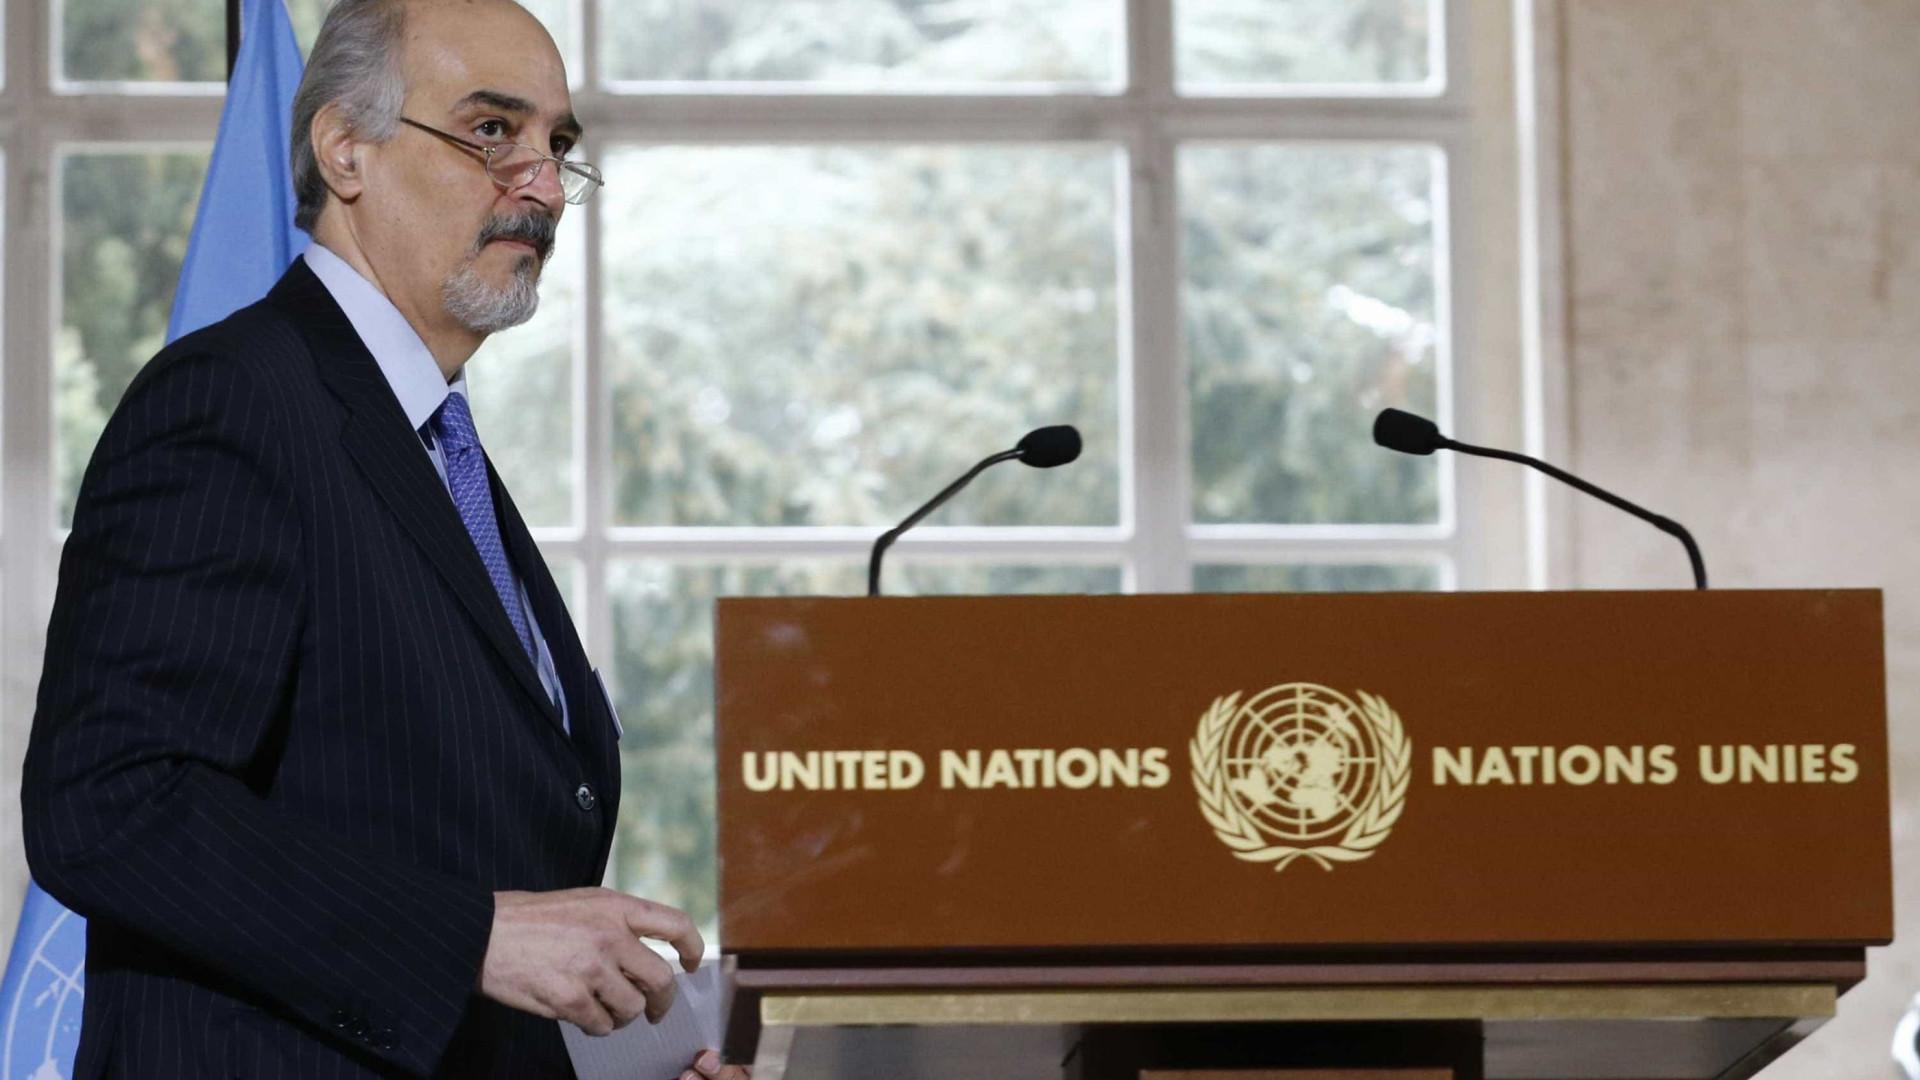 Damasco avisa Ocidente de que se defenderá se for atacada